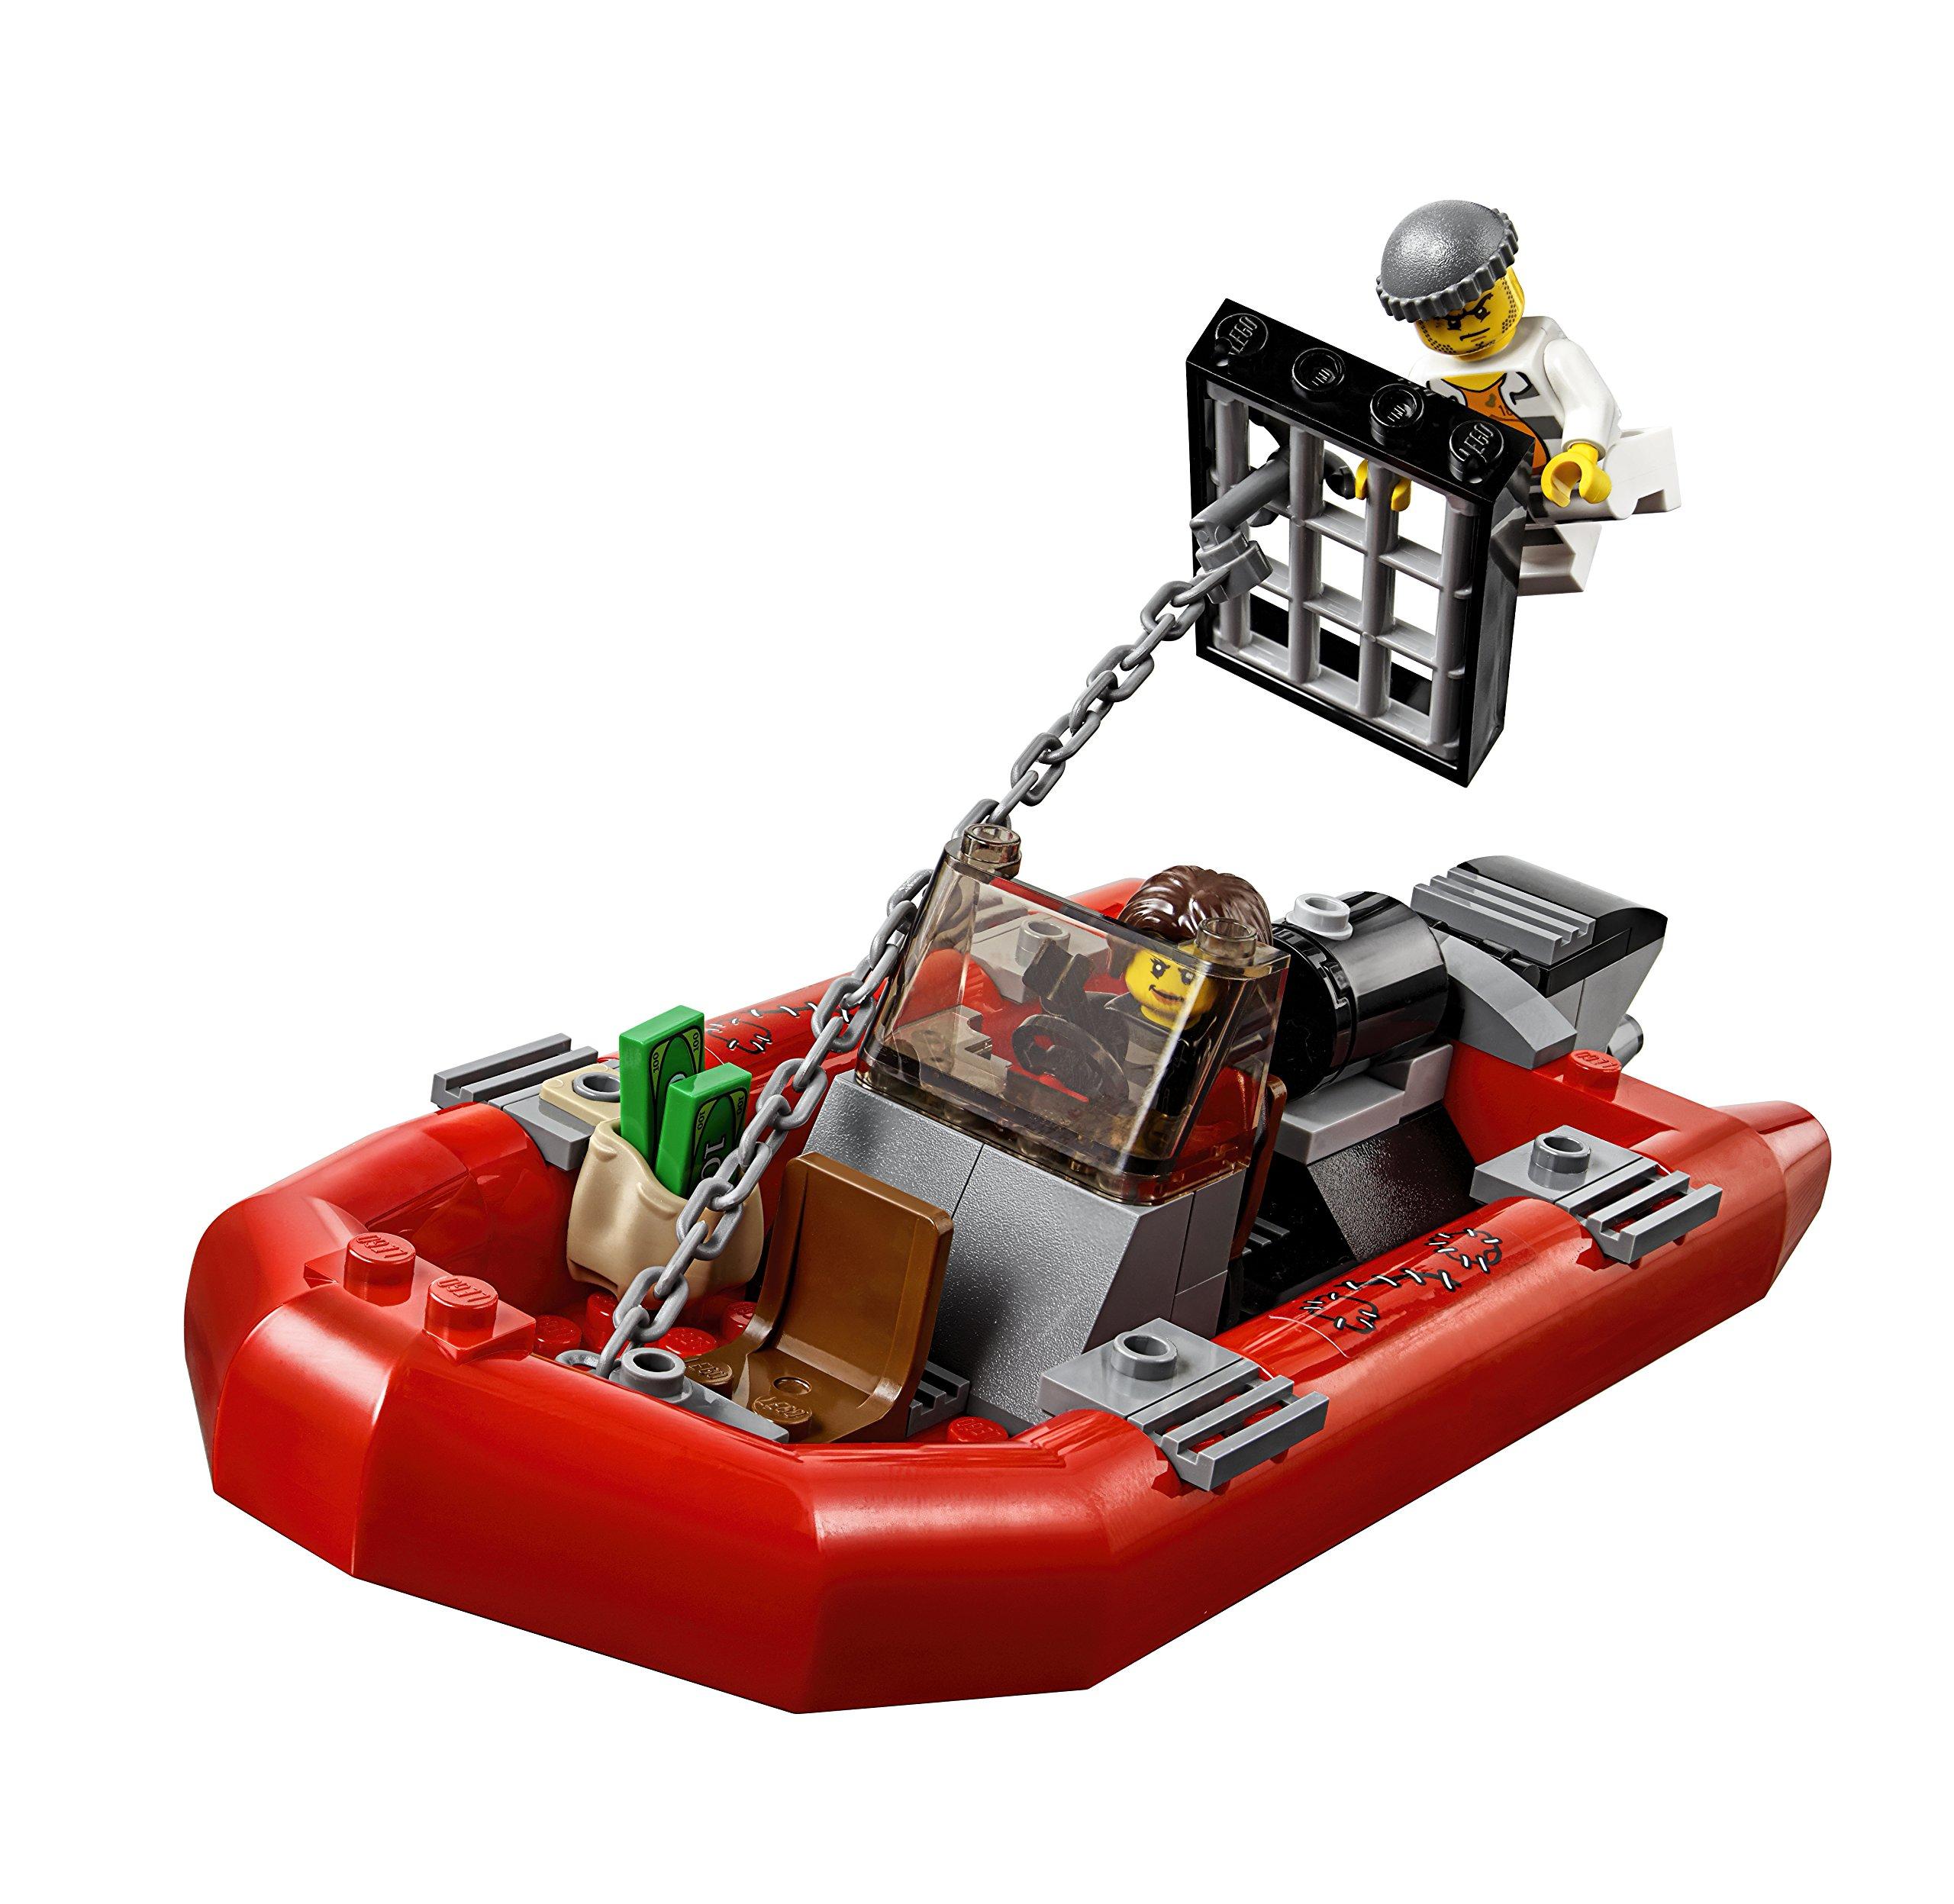 Lego Building Toys : Lego city police patrol boat building toy ebay